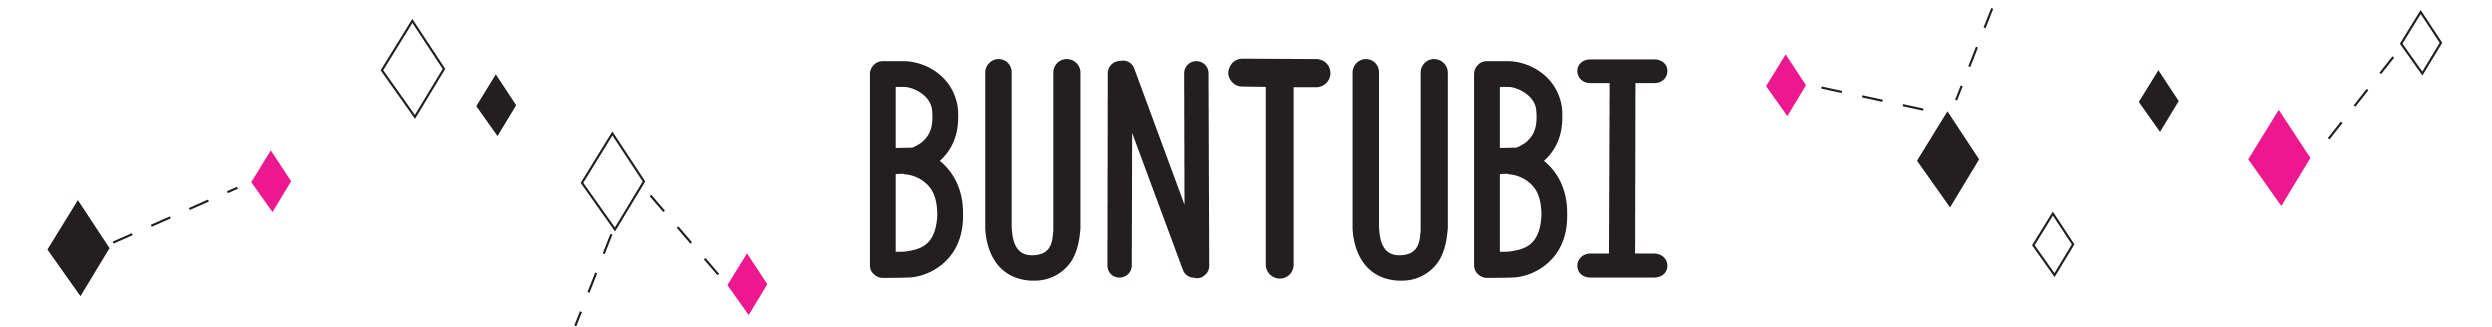 Buntubi.com